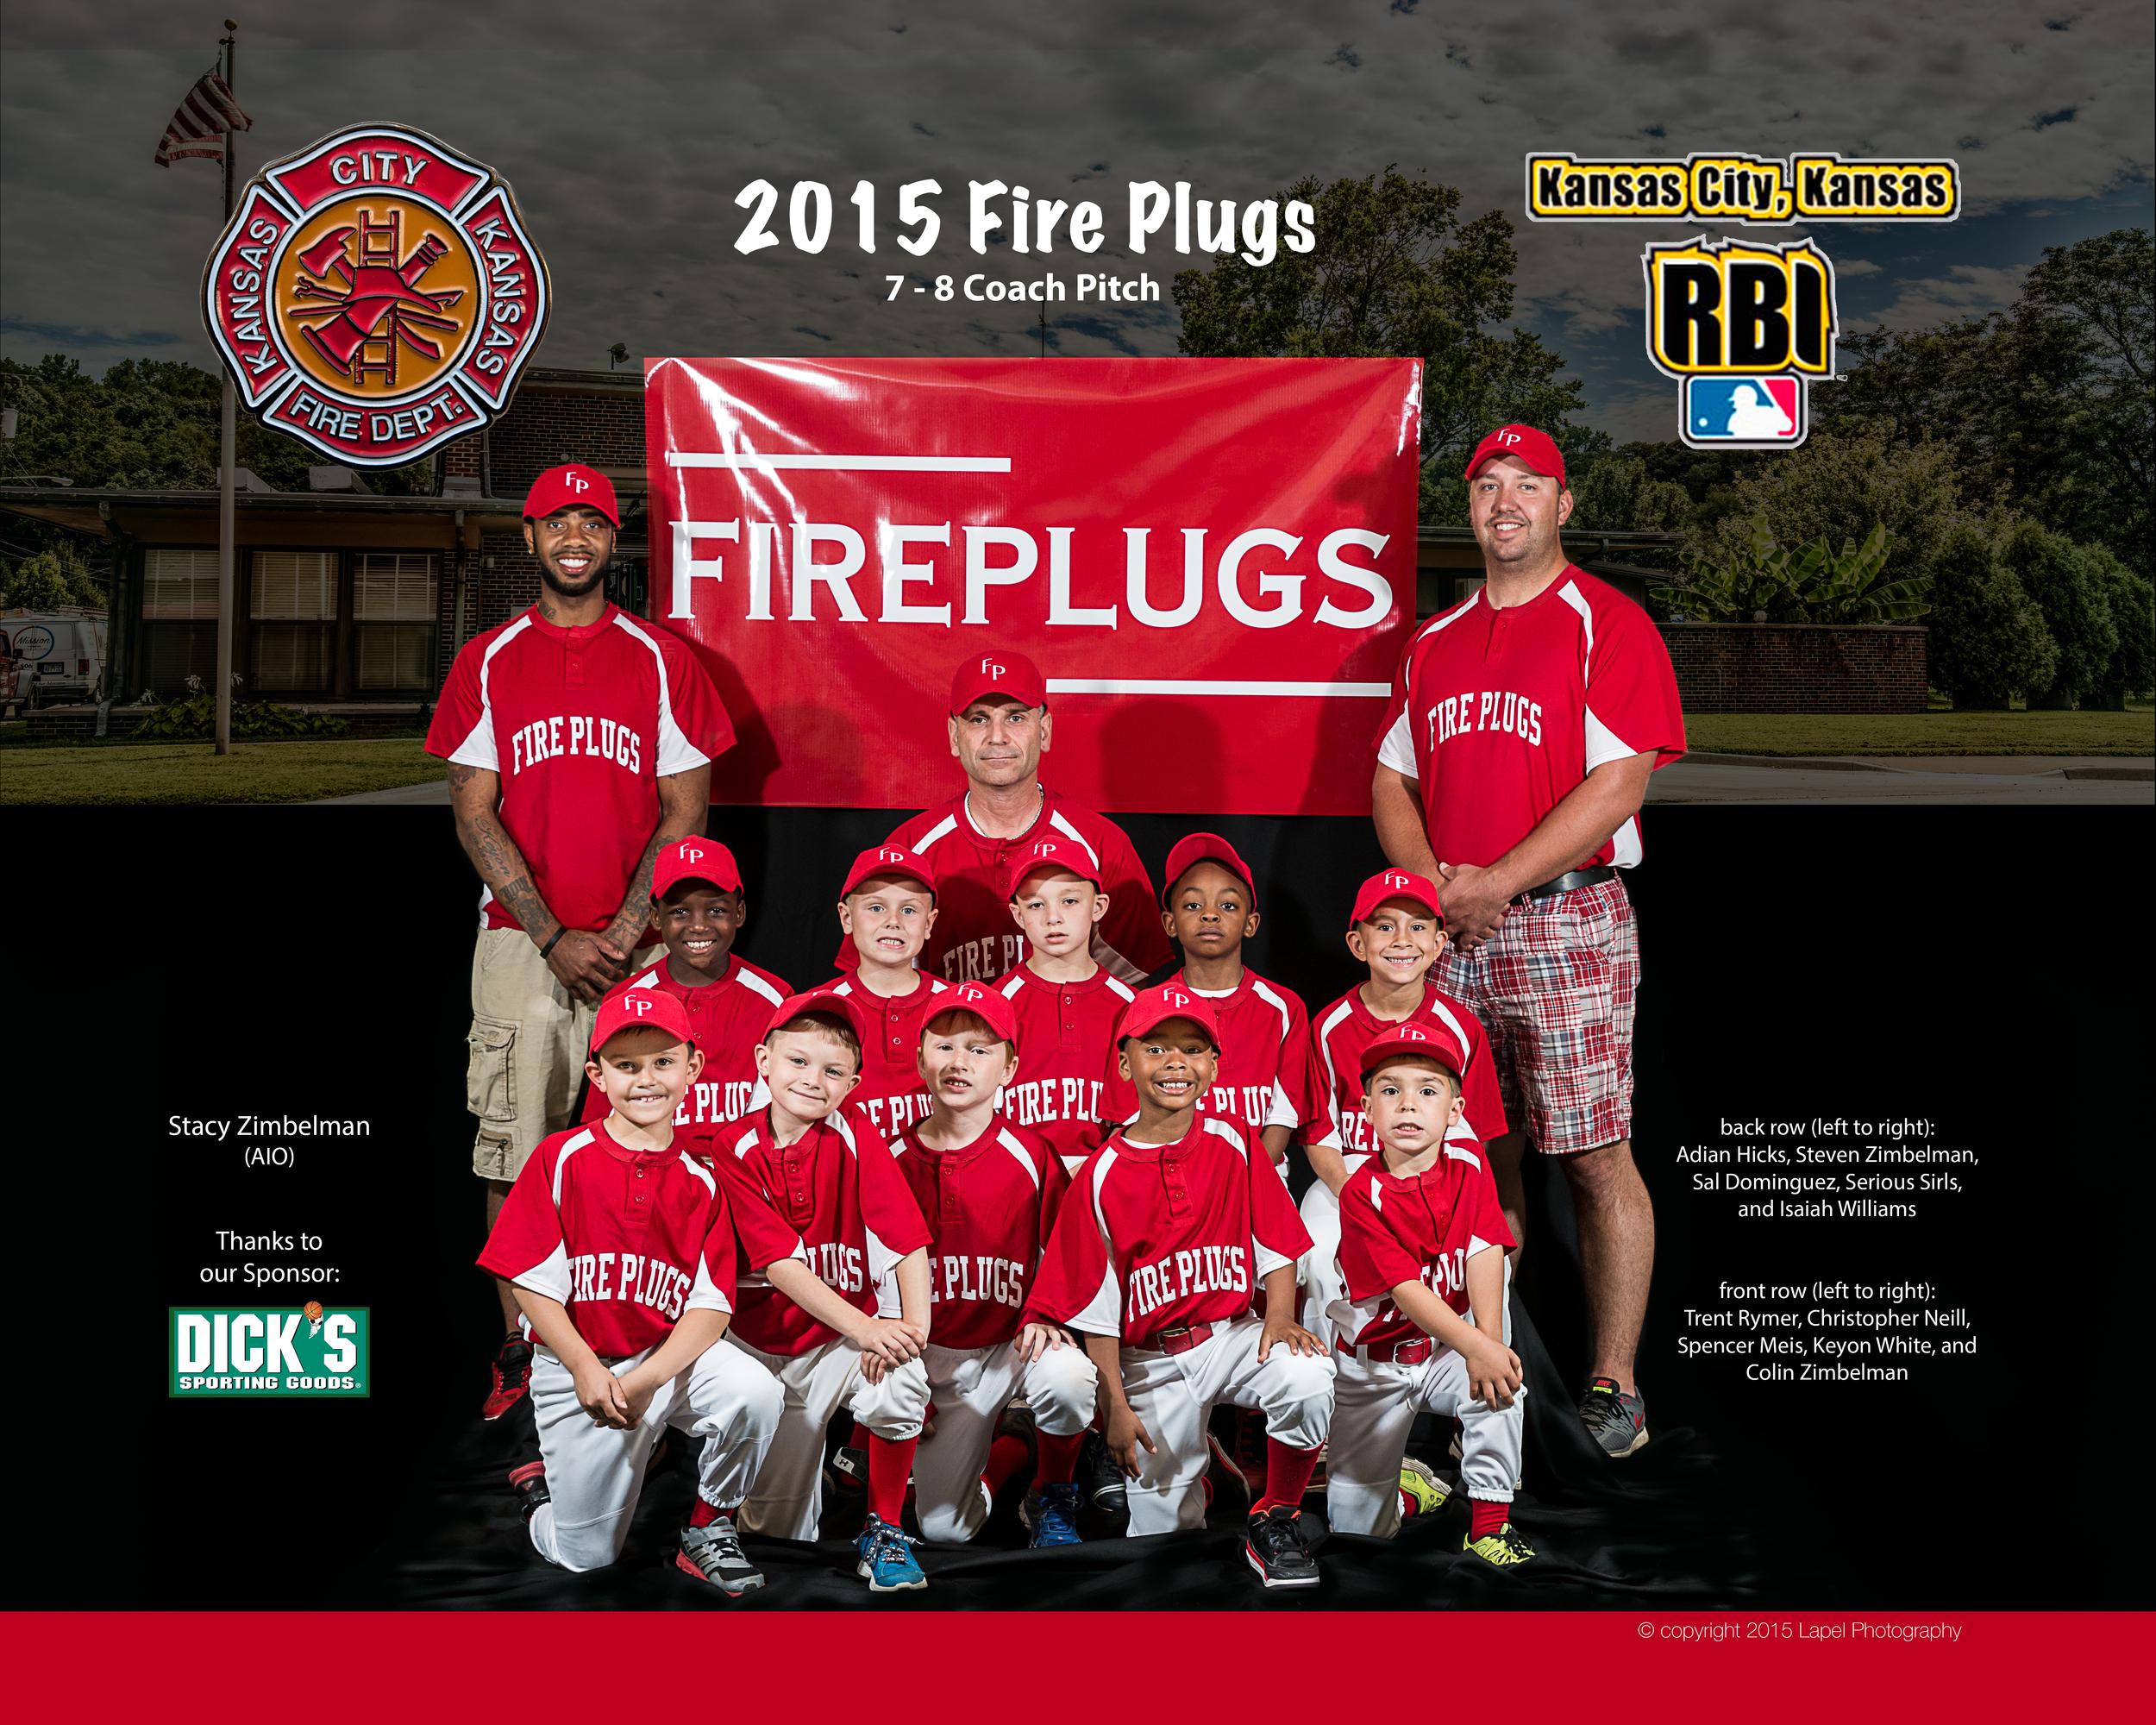 fireplugs.jpg